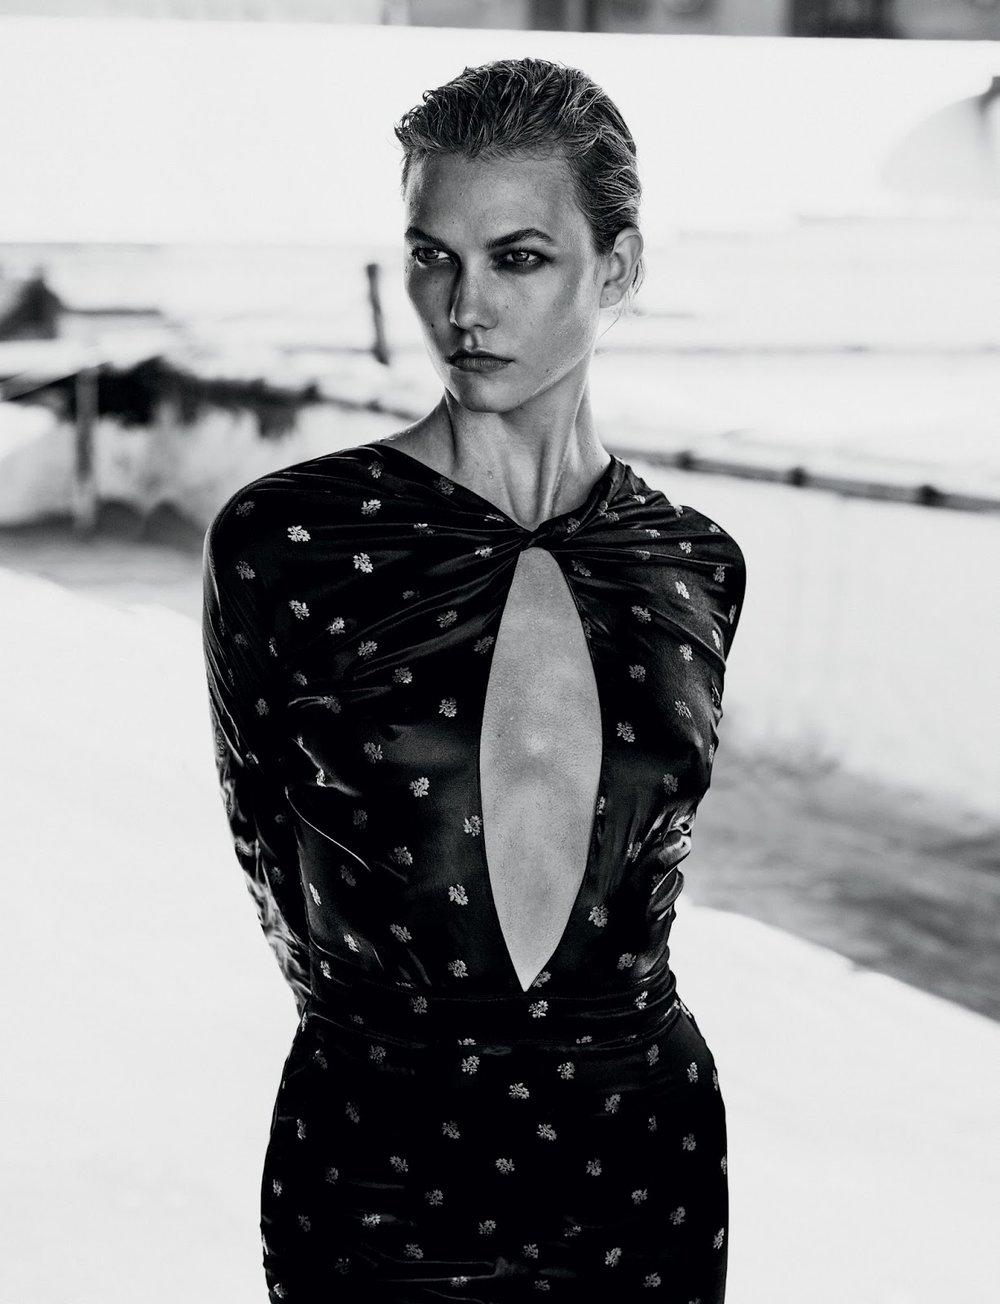 Vogue Mexico October 2016 - karlie-kloss-chris-colls- (5).jpg